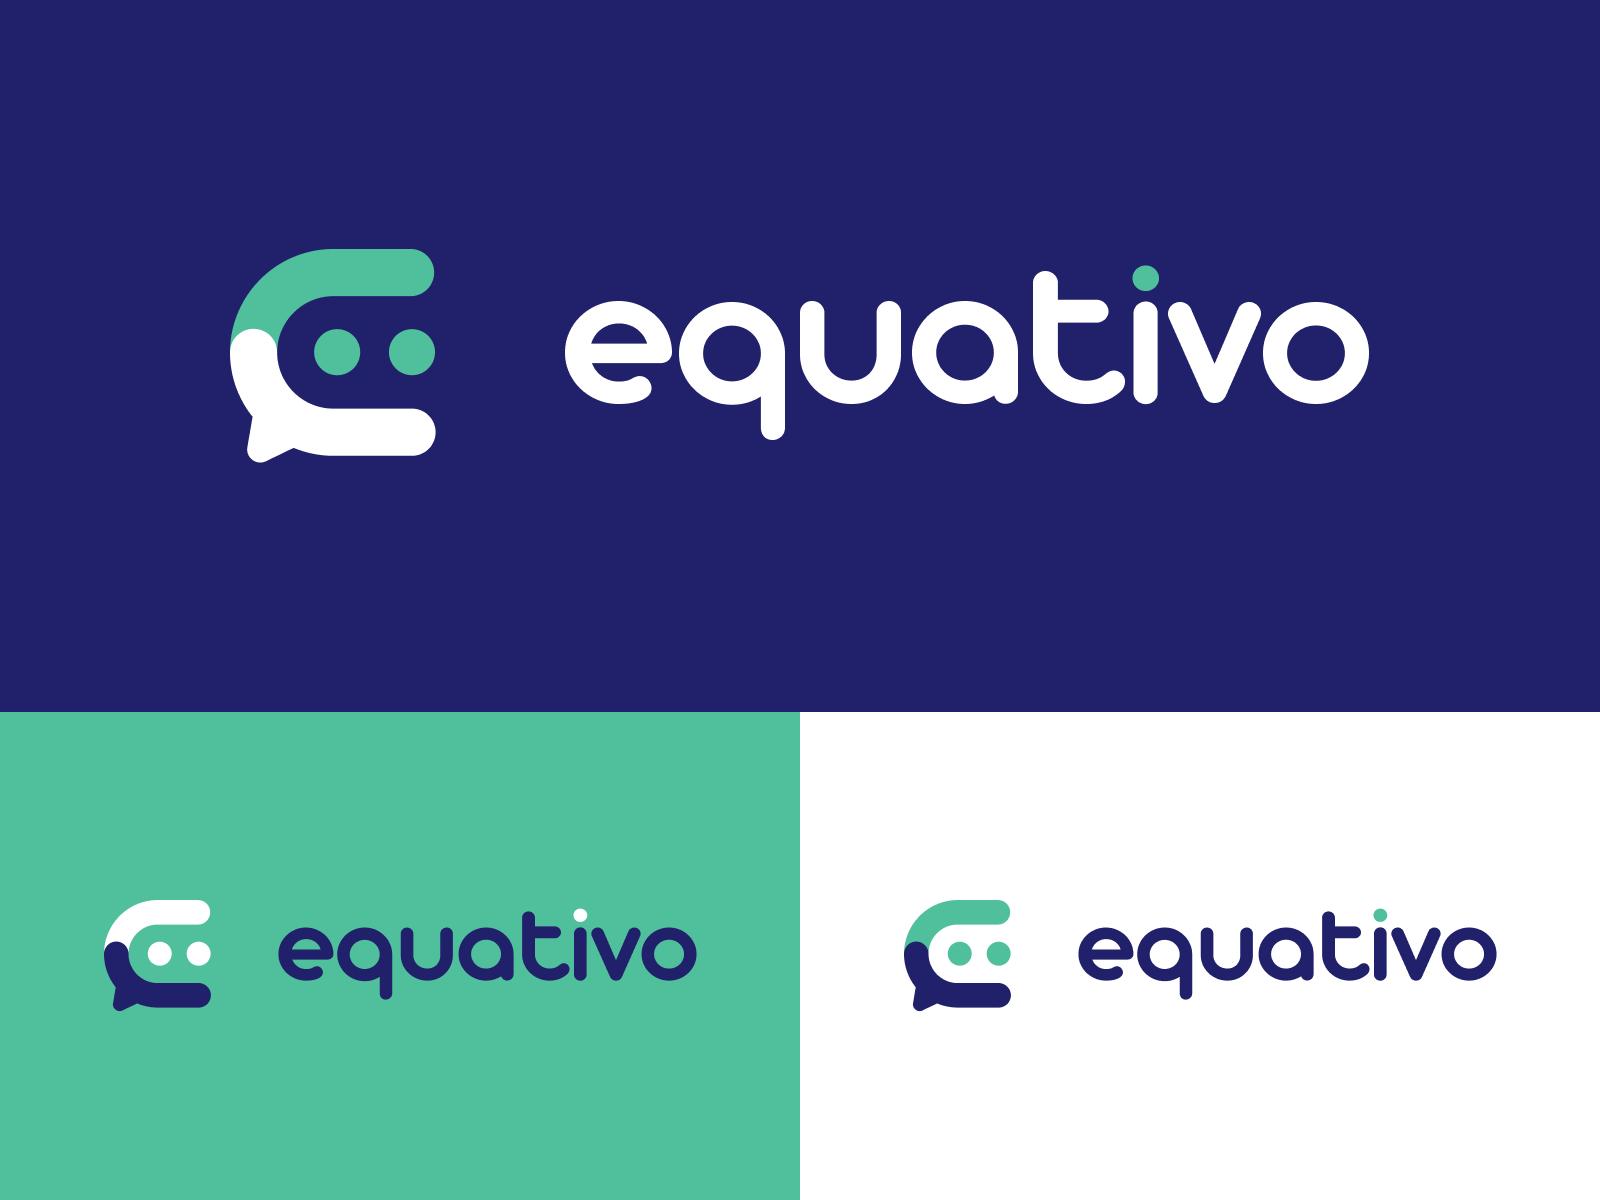 Equativo_logo_dribbble1